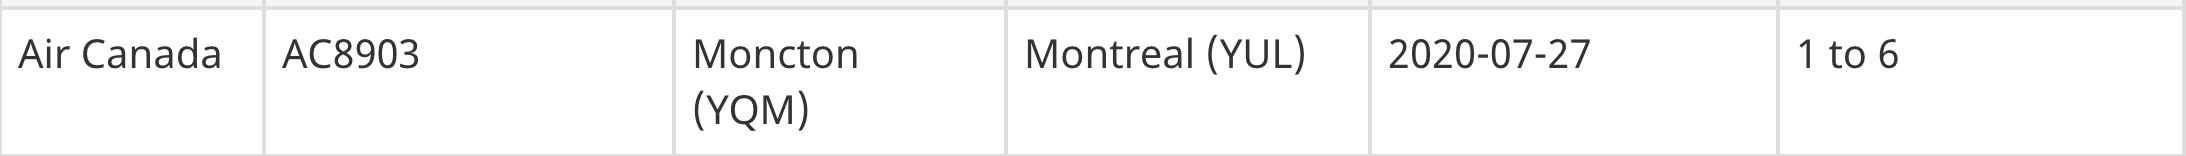 Montreal coronavirus flight